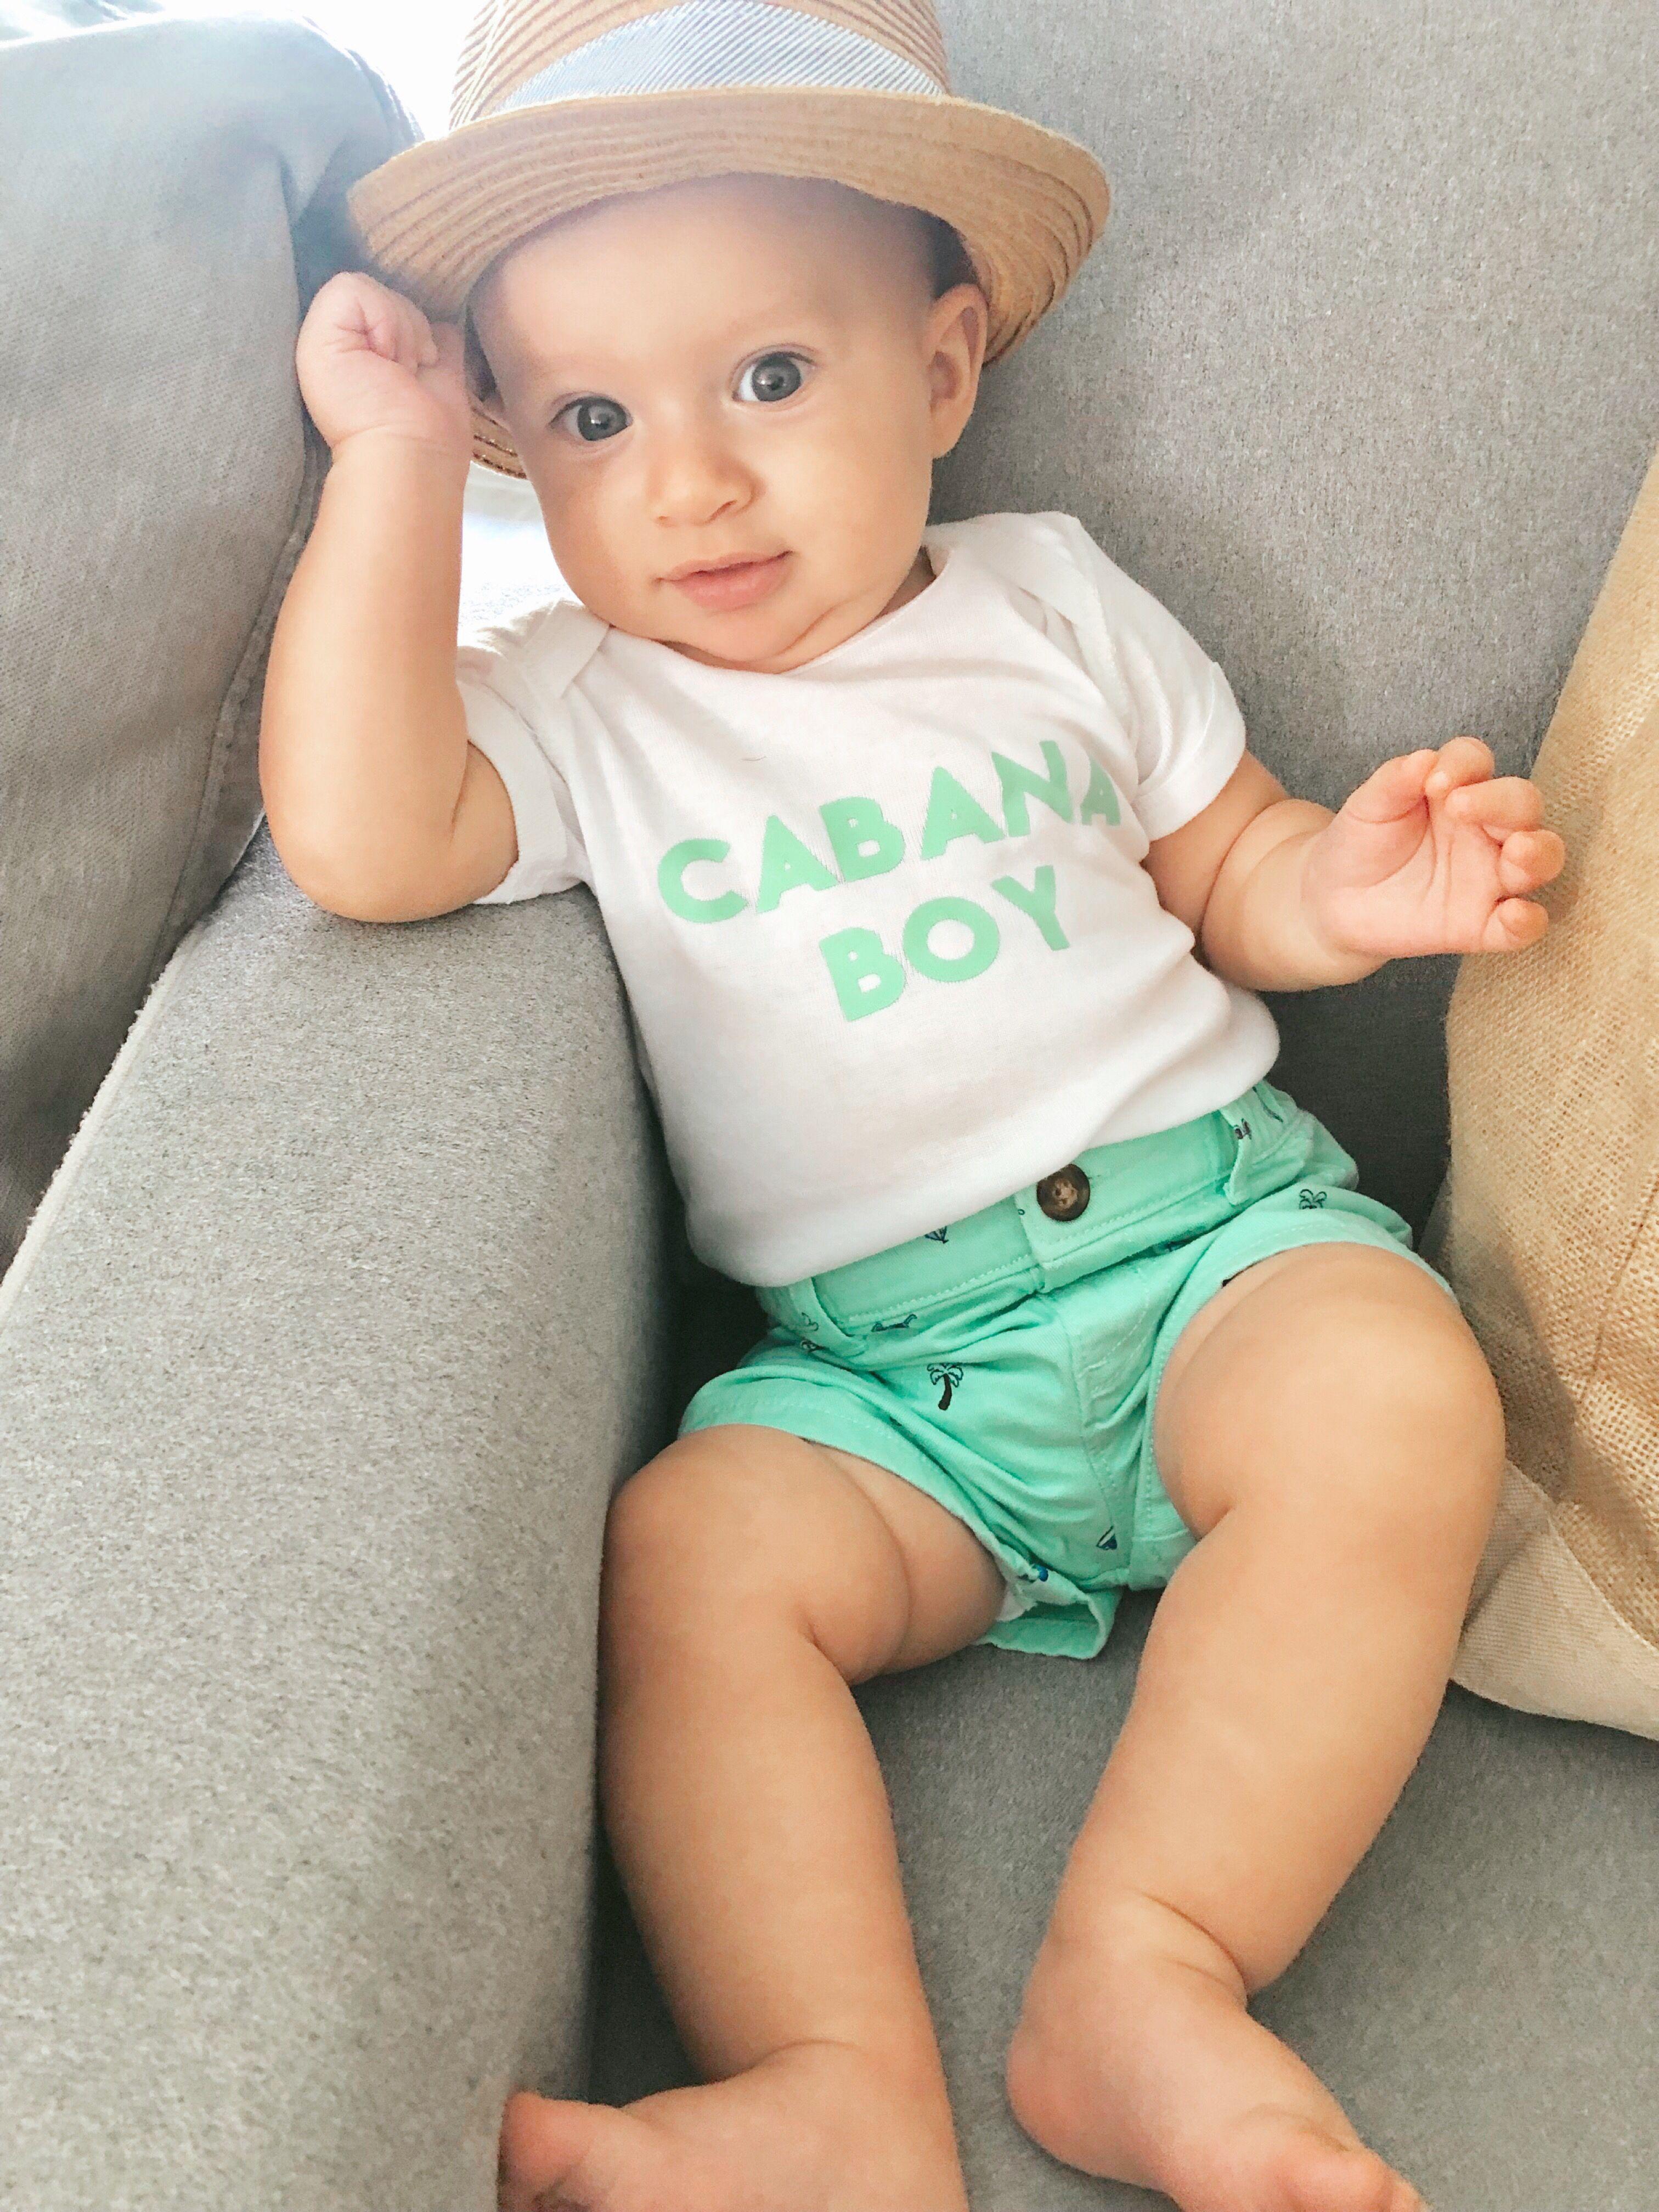 New born photography inspiration and cabana boy vacation